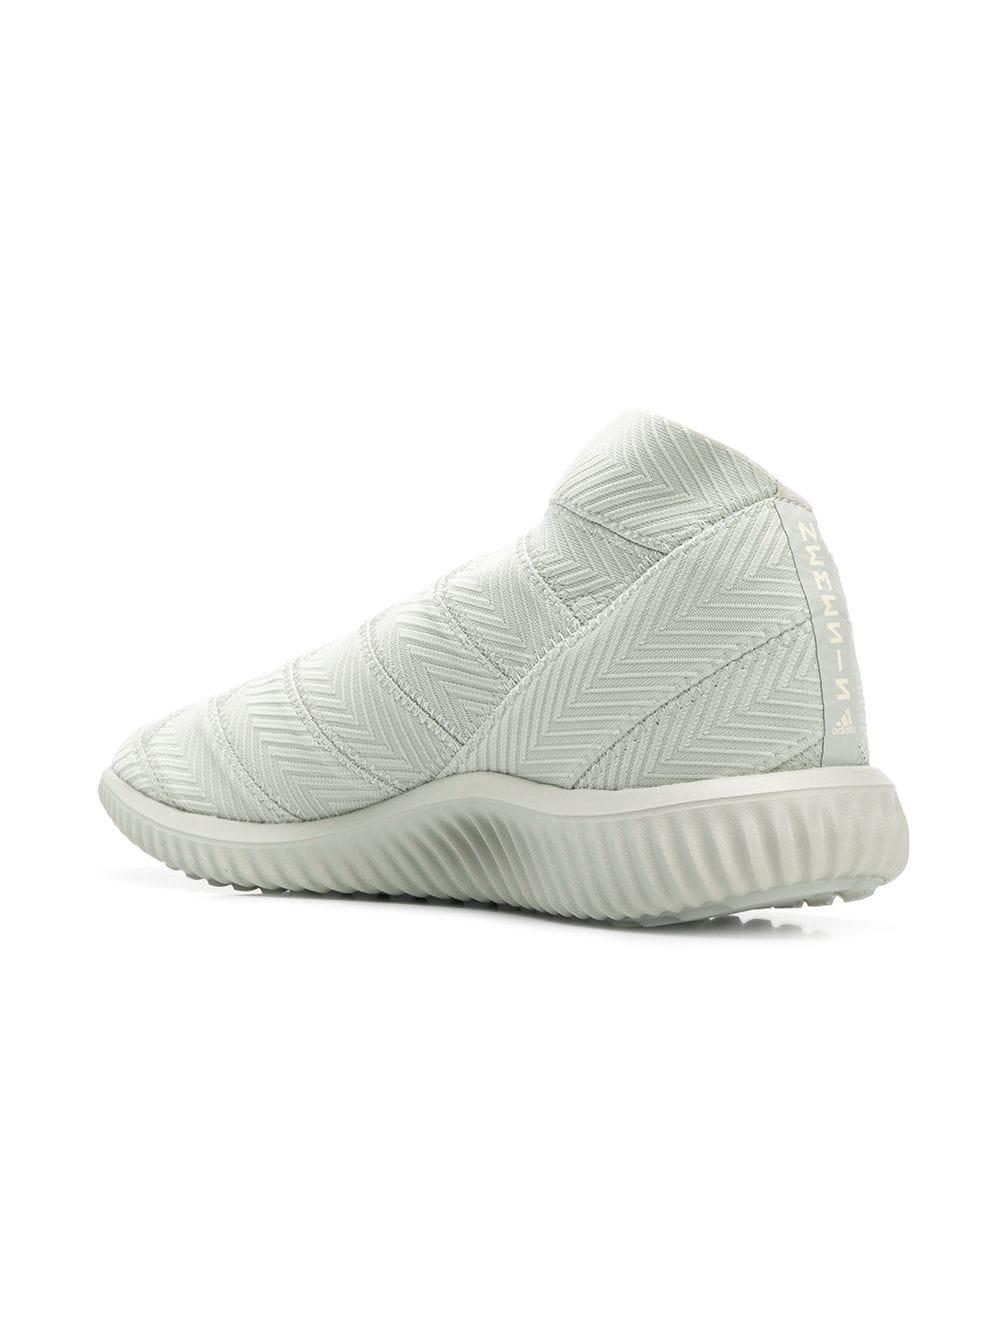 957fe0530 Lyst - adidas Nemeziz Tango 18.1 Sneakers in Gray for Men